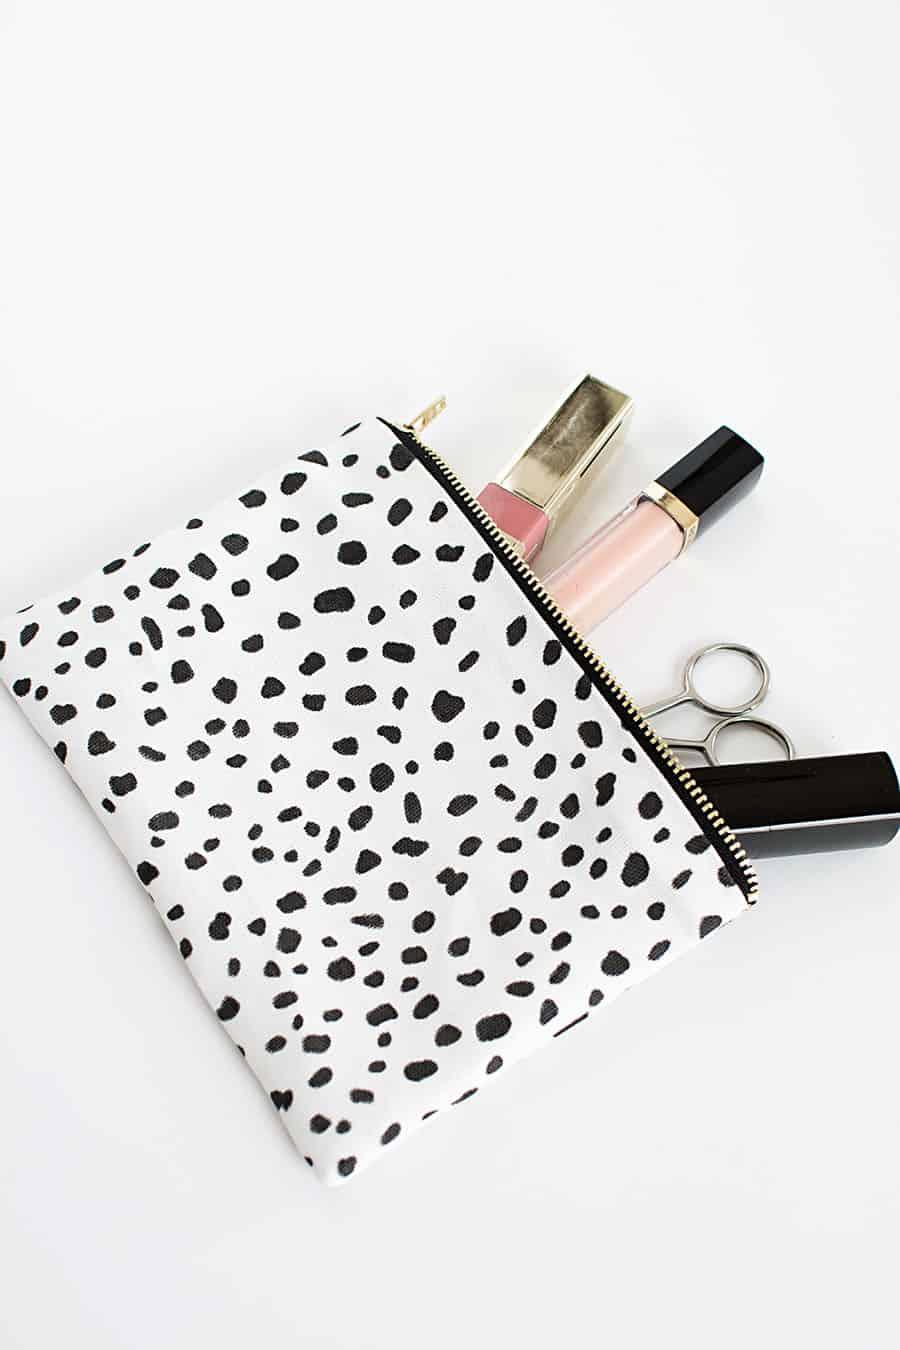 DIY-no-sew-zipper-pouch